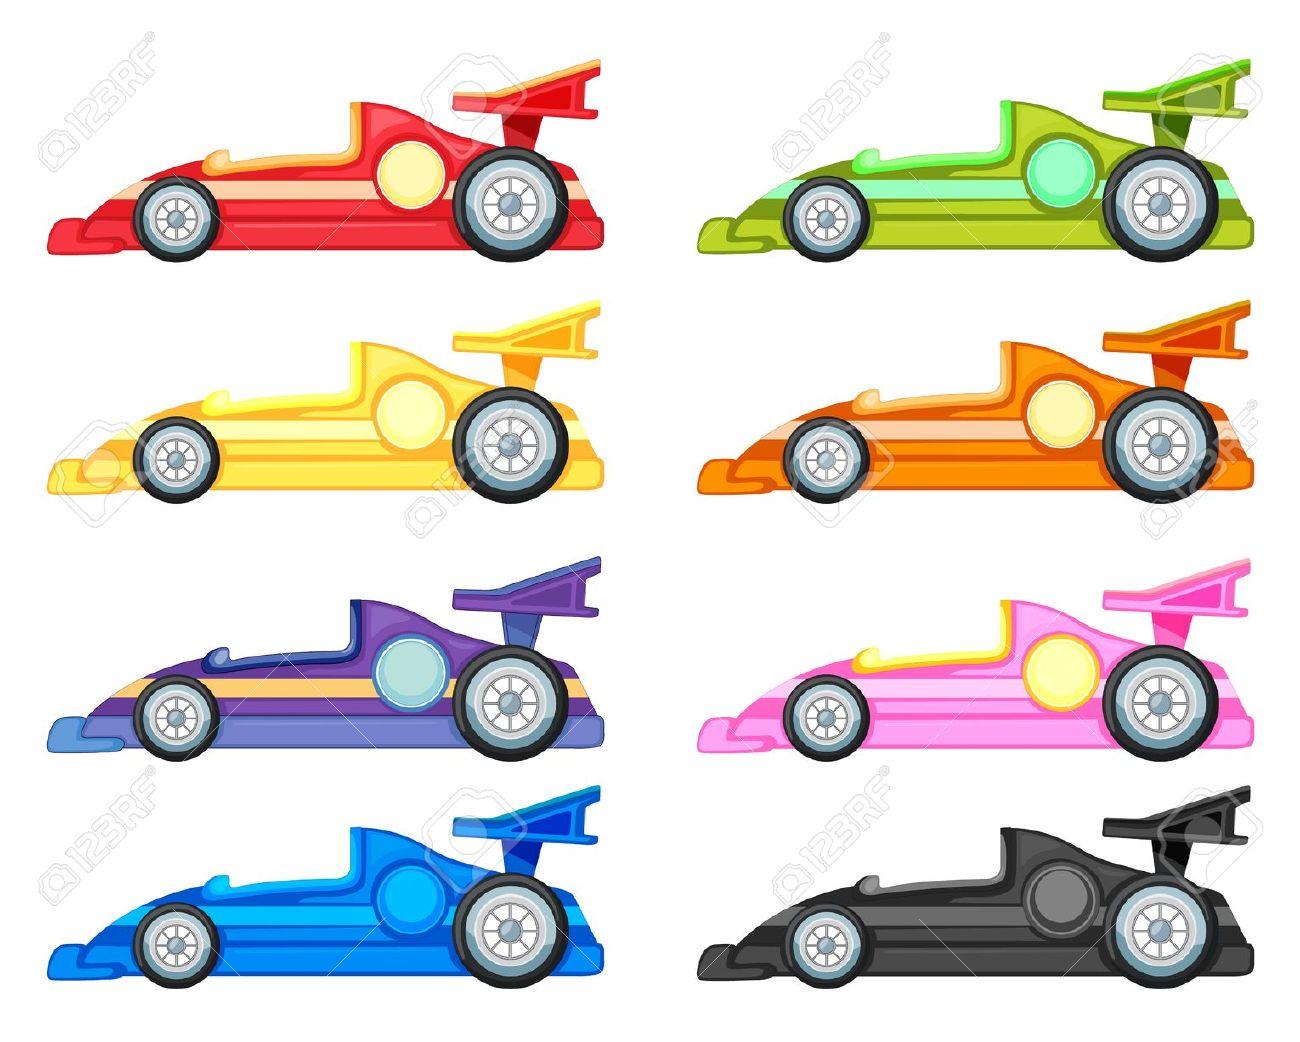 1300x1042 Race Car Clipart Vehicle